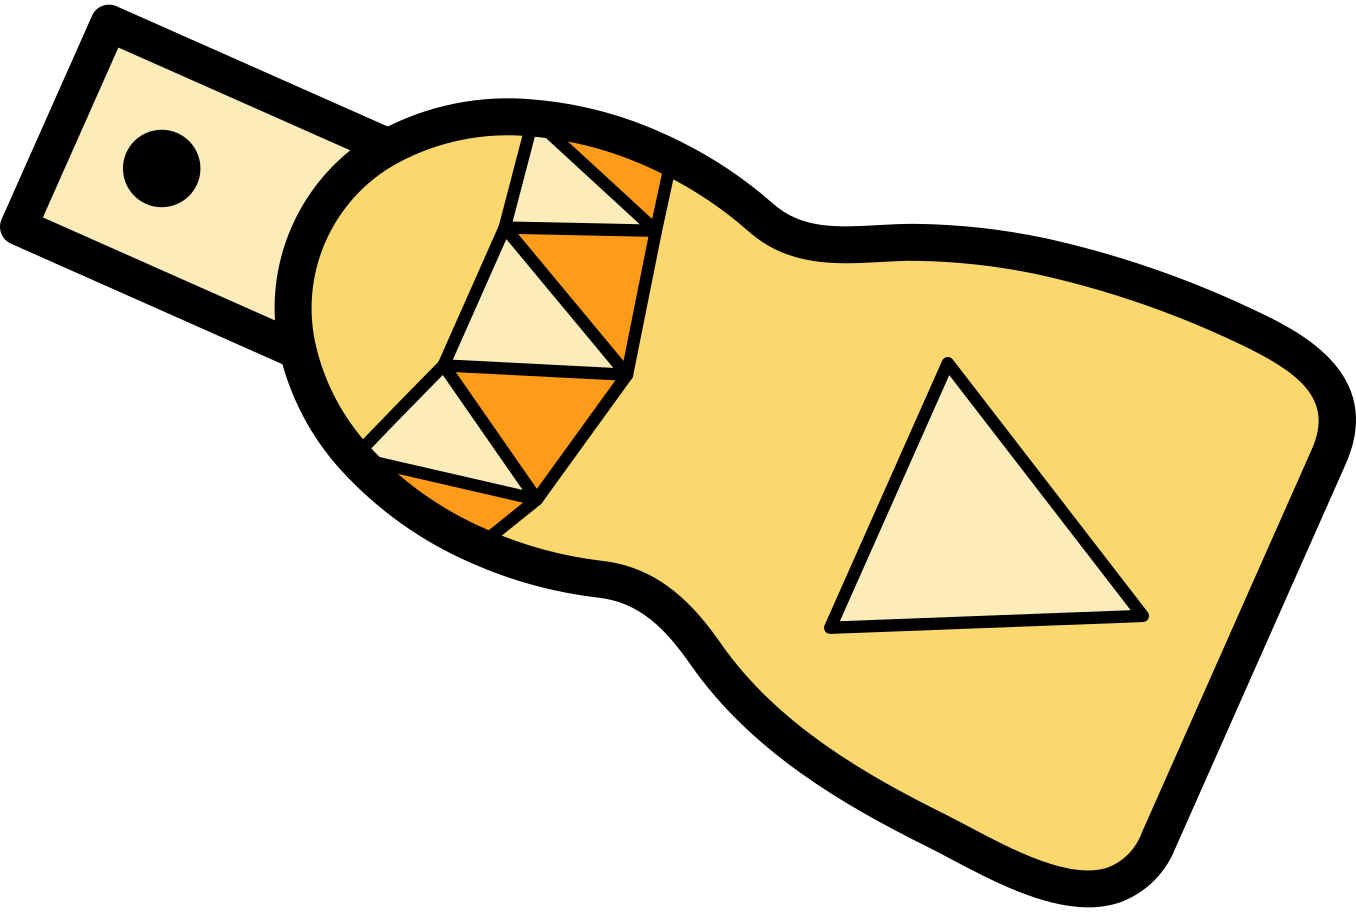 parfume Clipart illustration in PNG, SVG